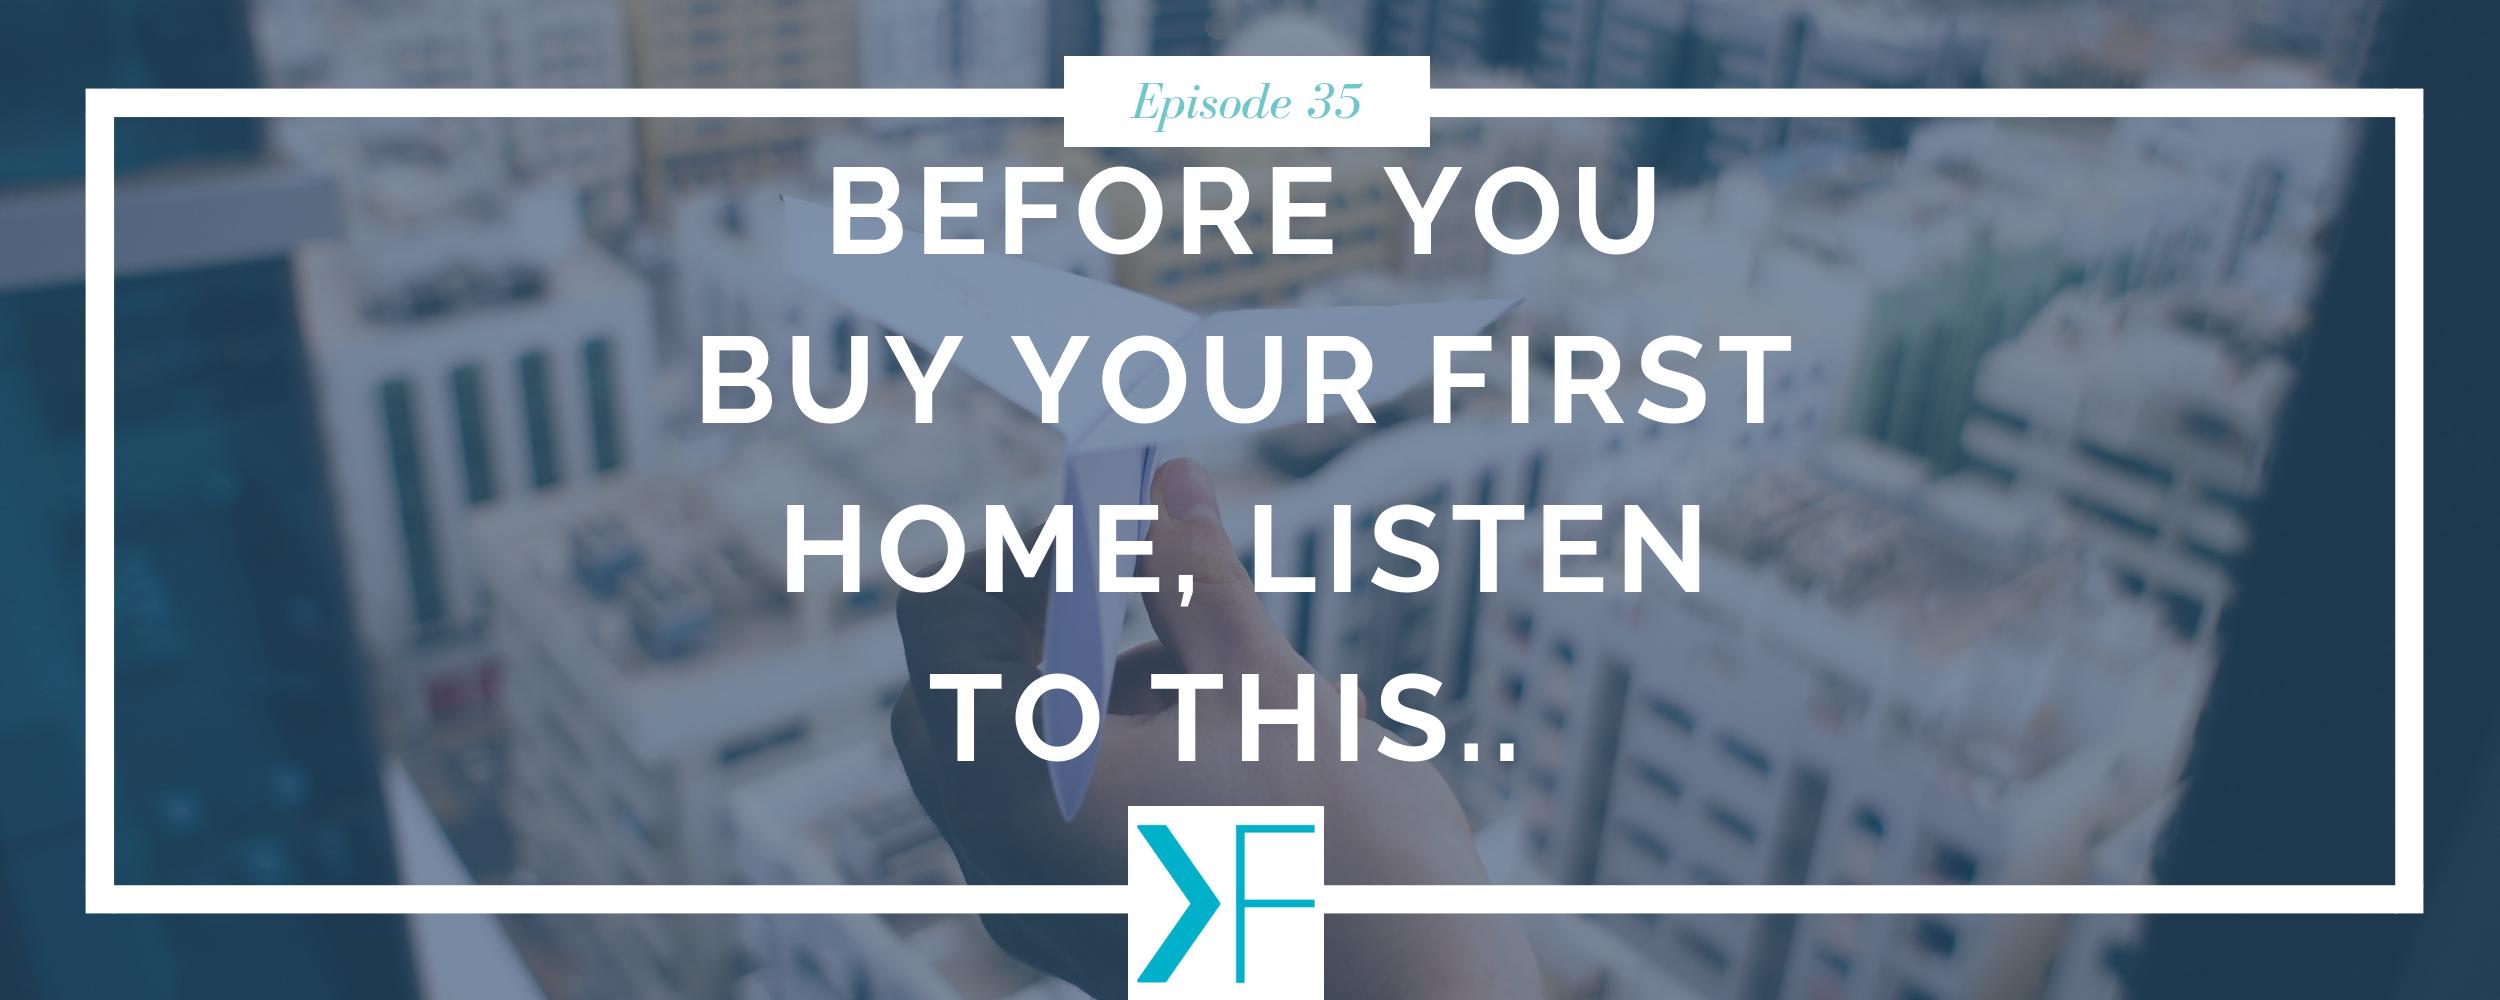 Buy first home in twenties